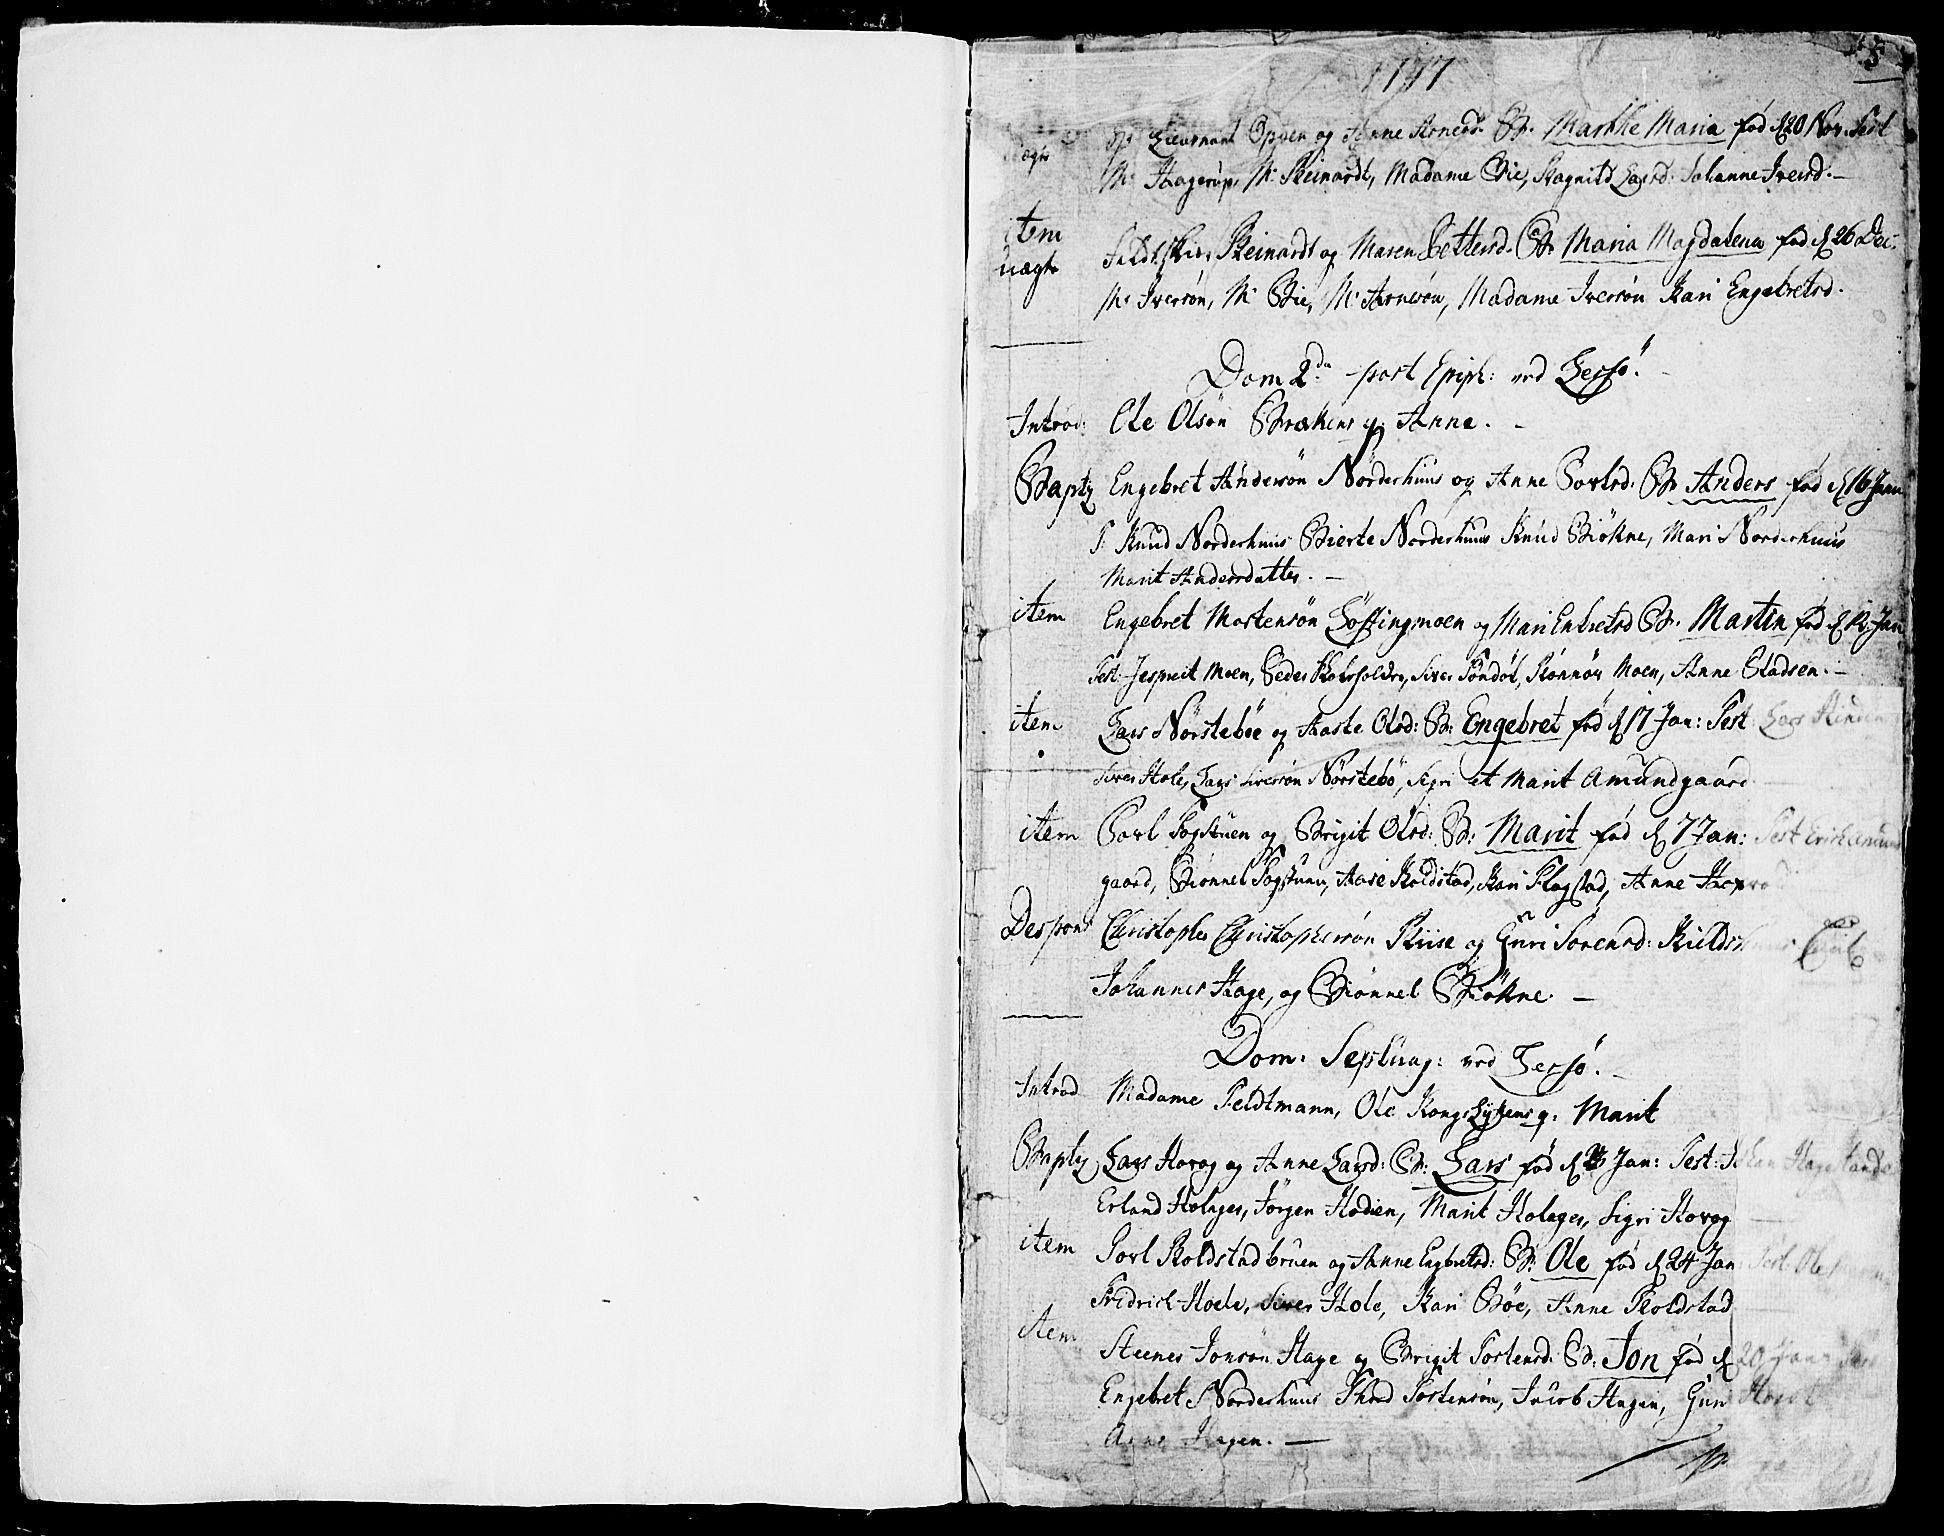 SAH, Lesja prestekontor, Parish register (official) no. 3, 1777-1819, p. 4-5